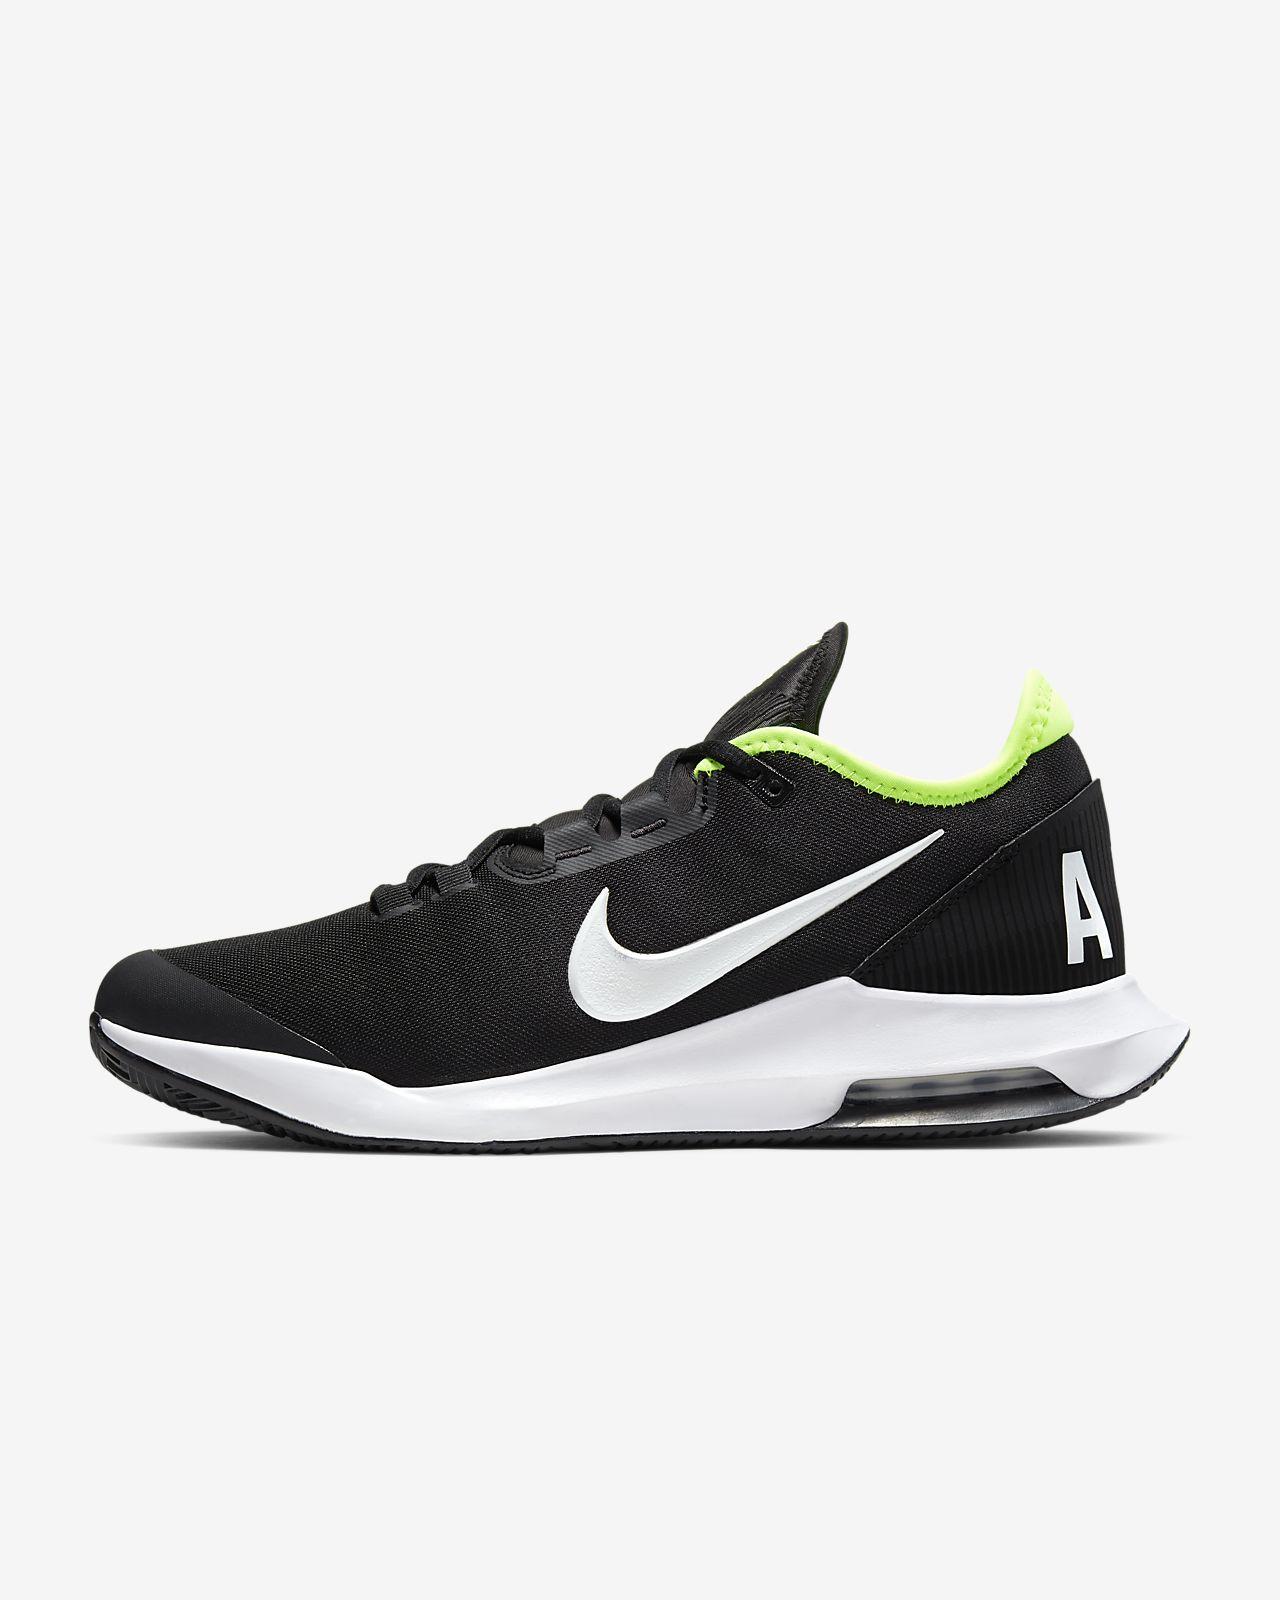 NikeCourt Air Max Wildcard Clay Tennisschuh für Männer